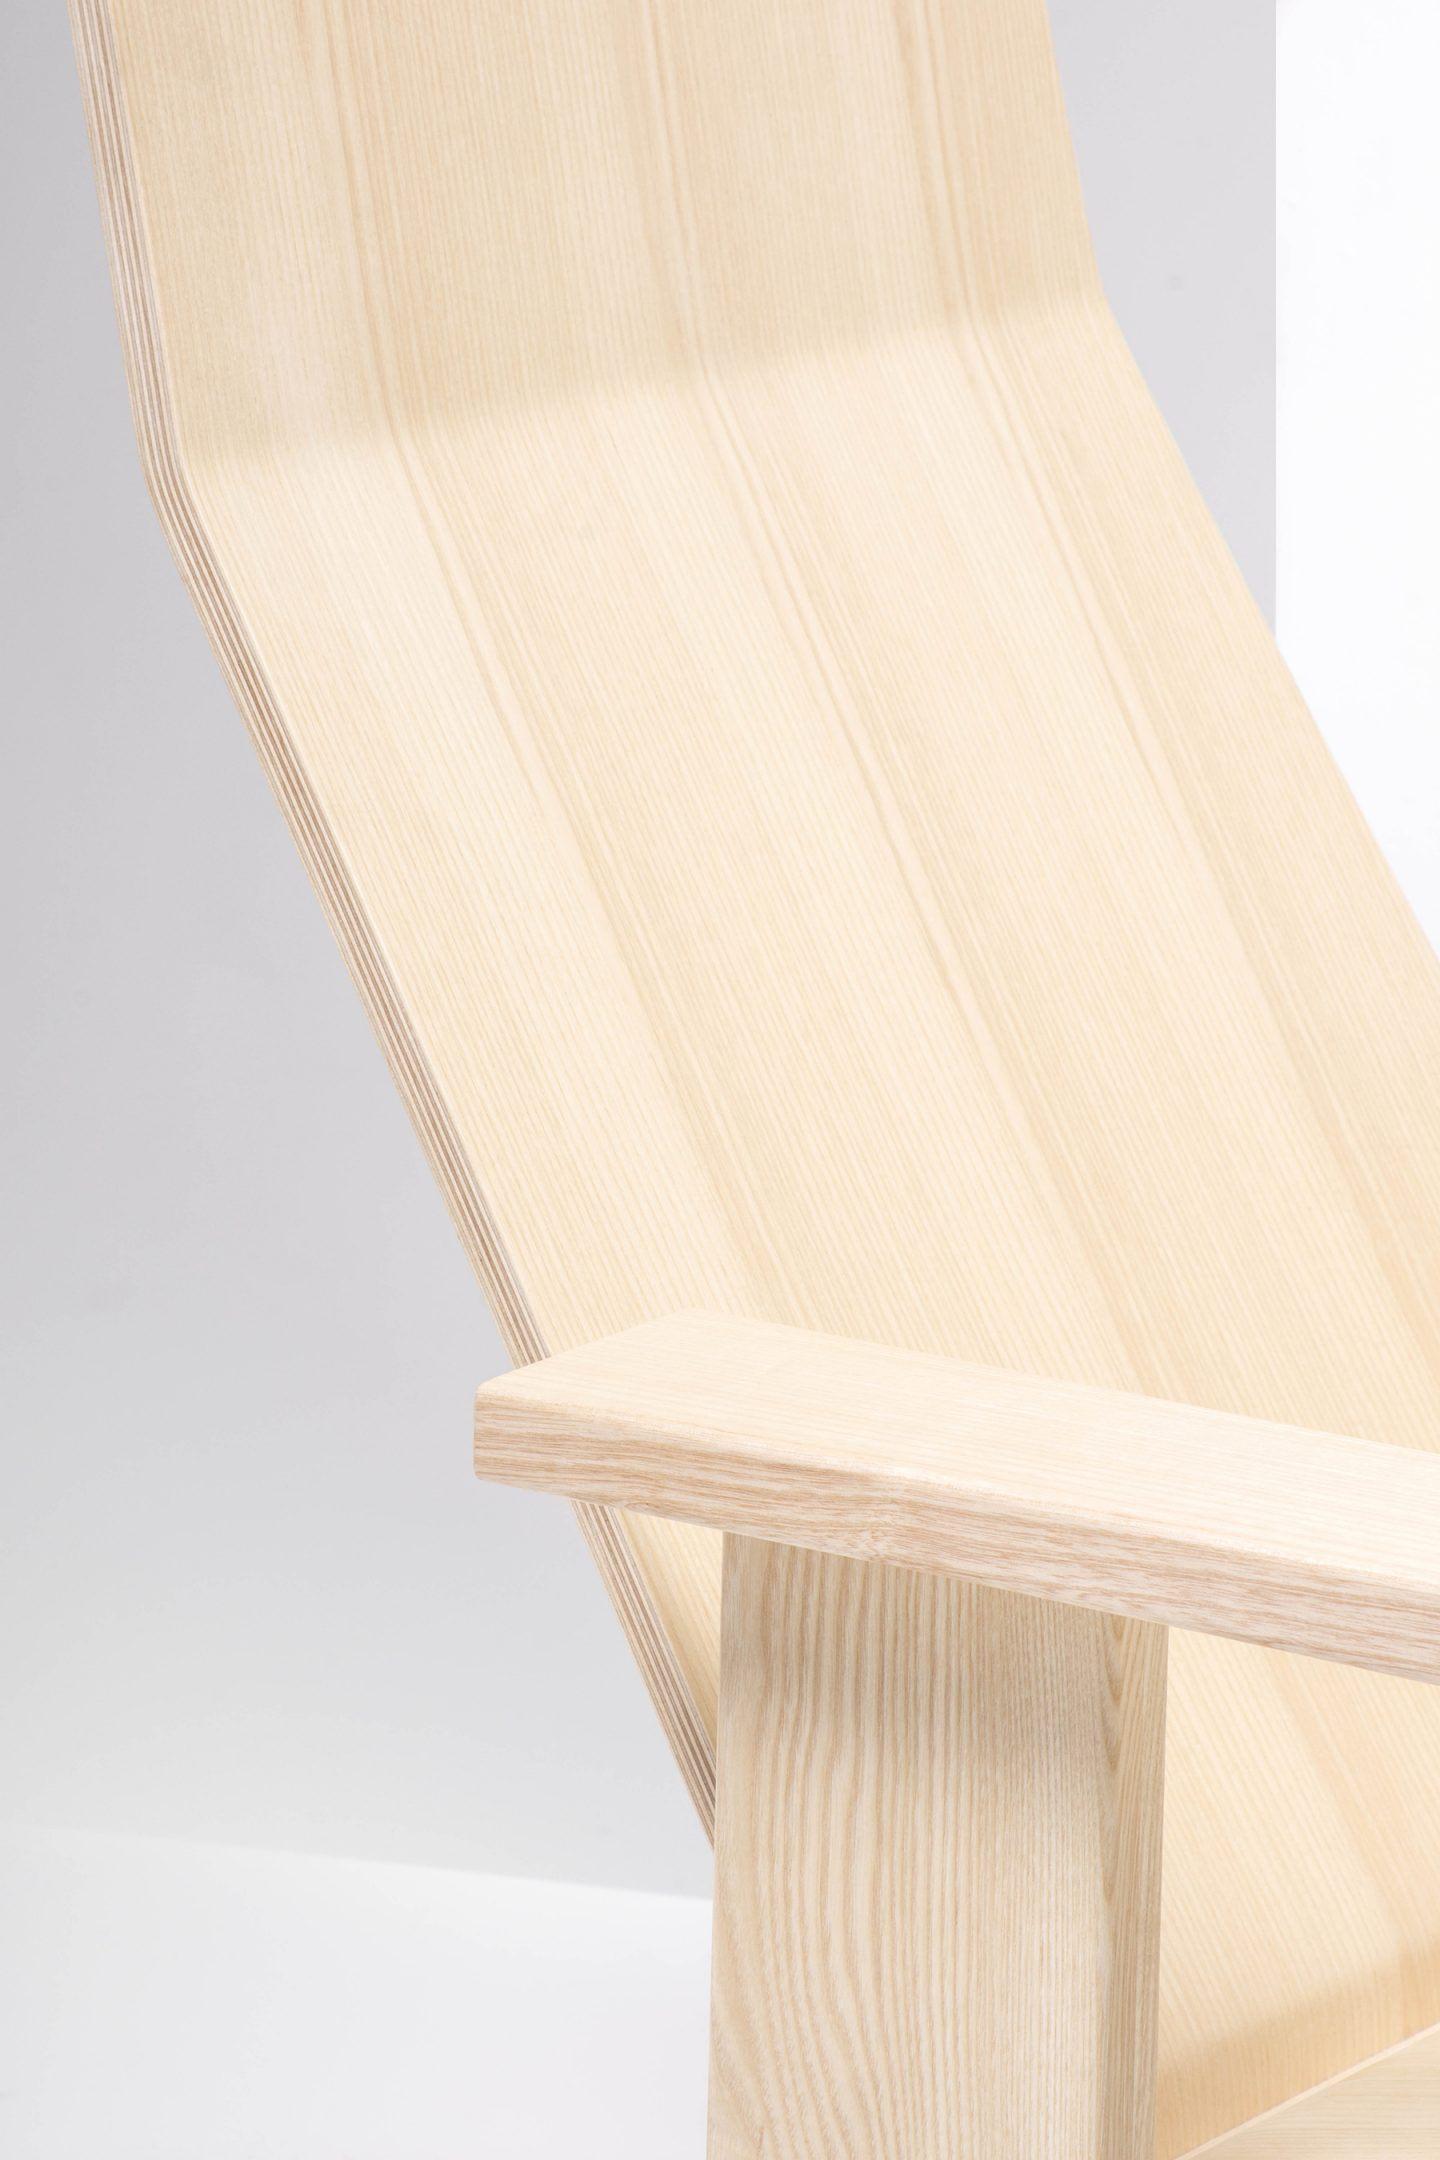 IGNANT-Design-Ronan-And-Erwan-Bouroullec-Quindici-06